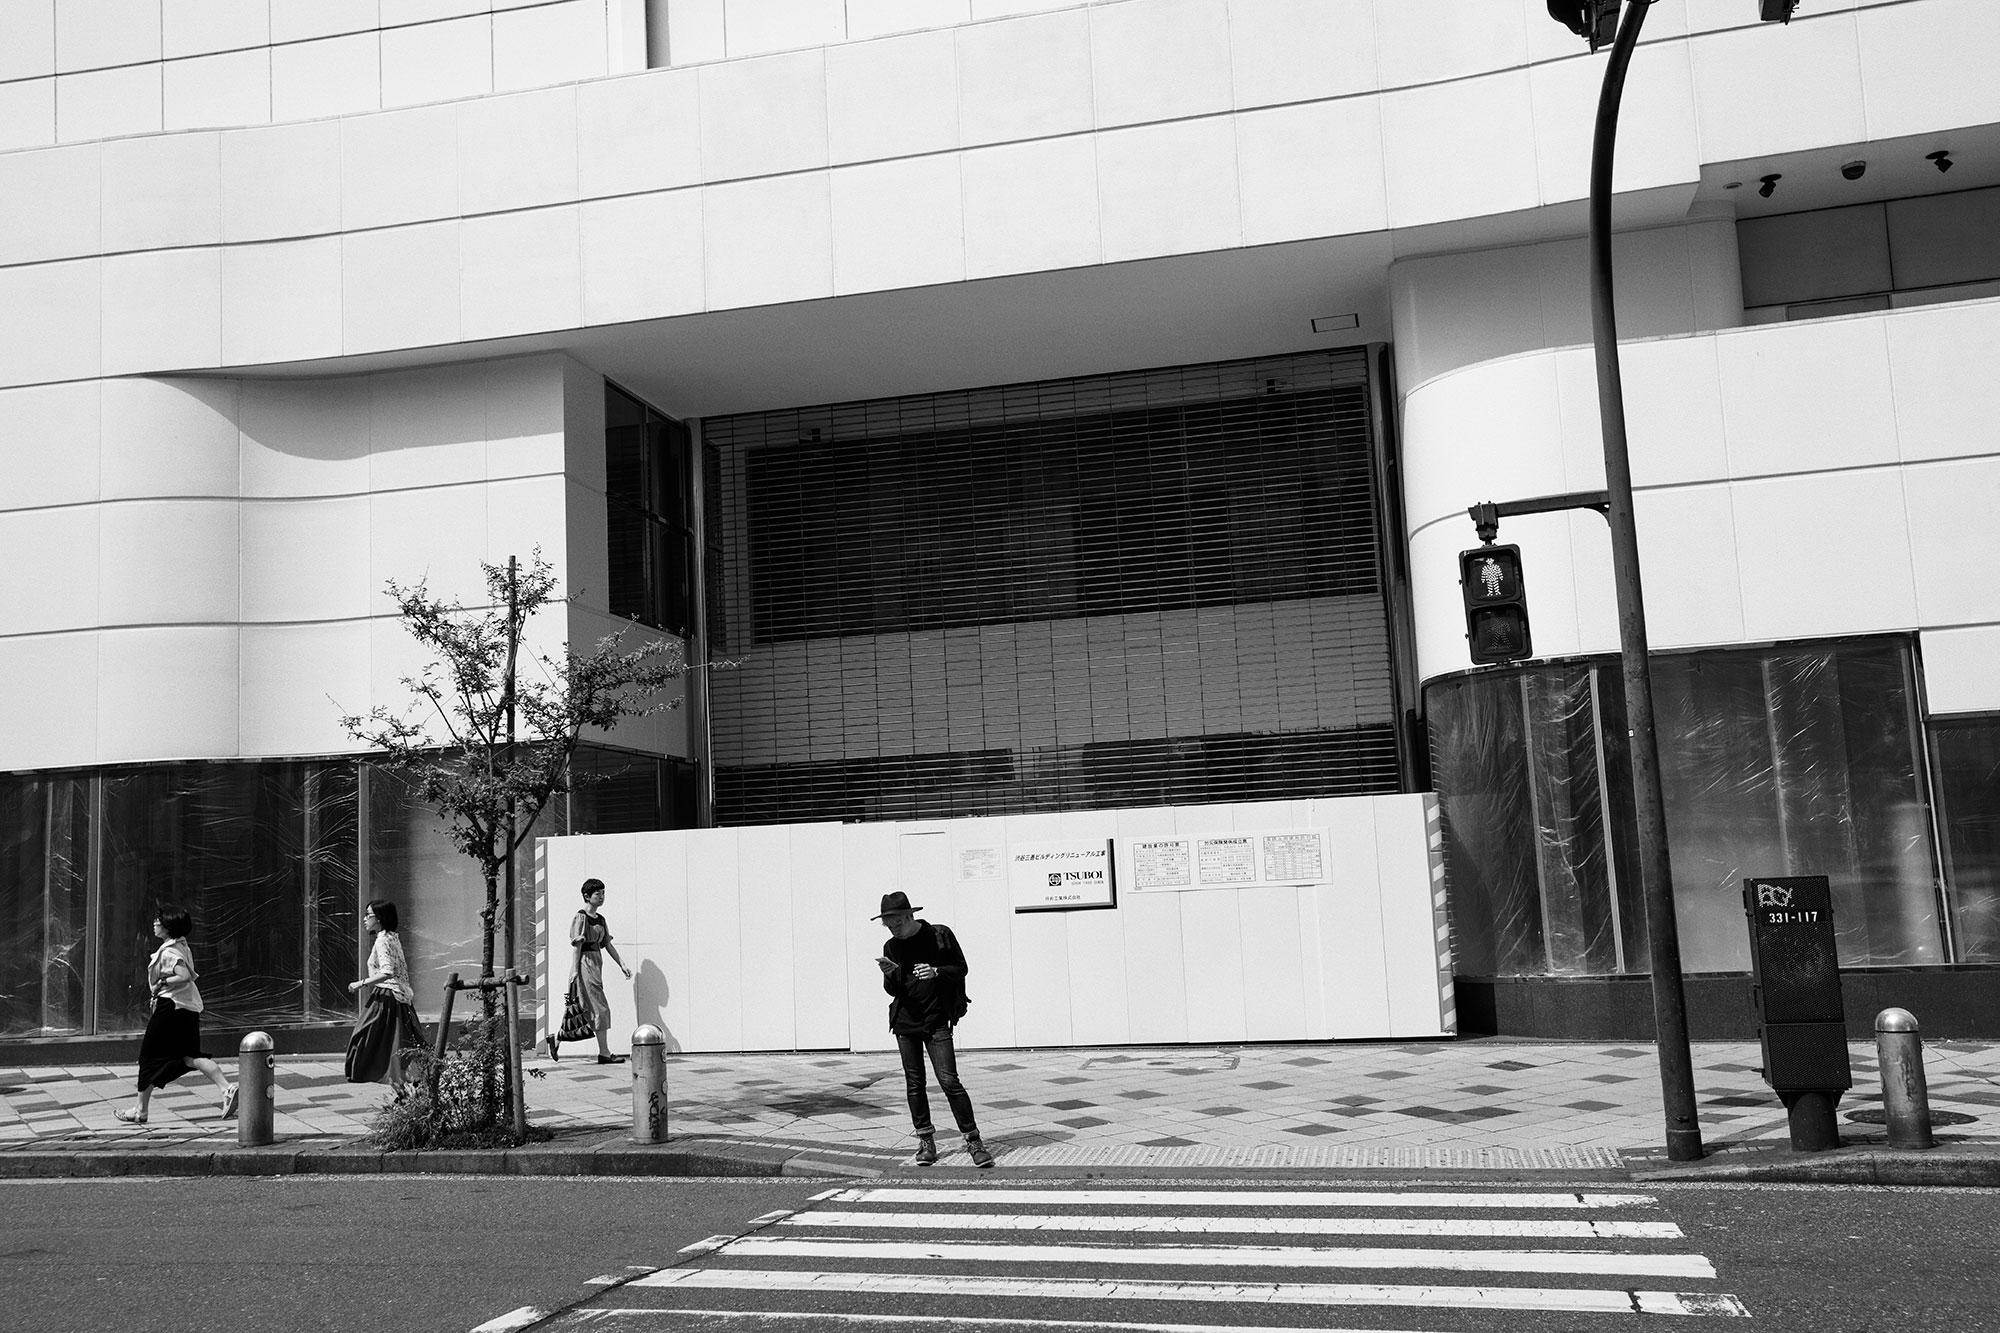 「Lonesome Day Blues」 | © Kazumi Kurigami